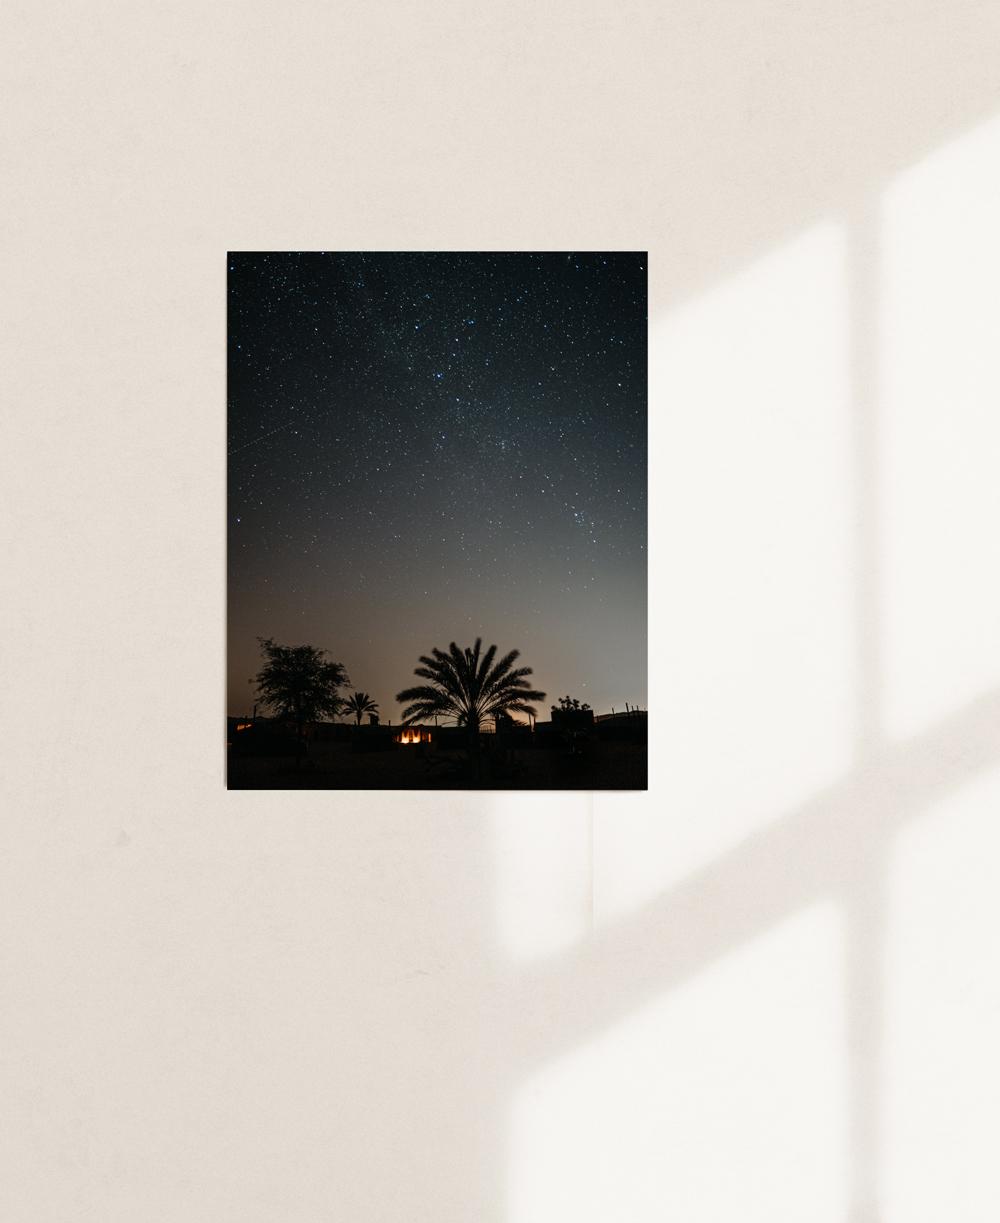 nicischwab-prints-02-020